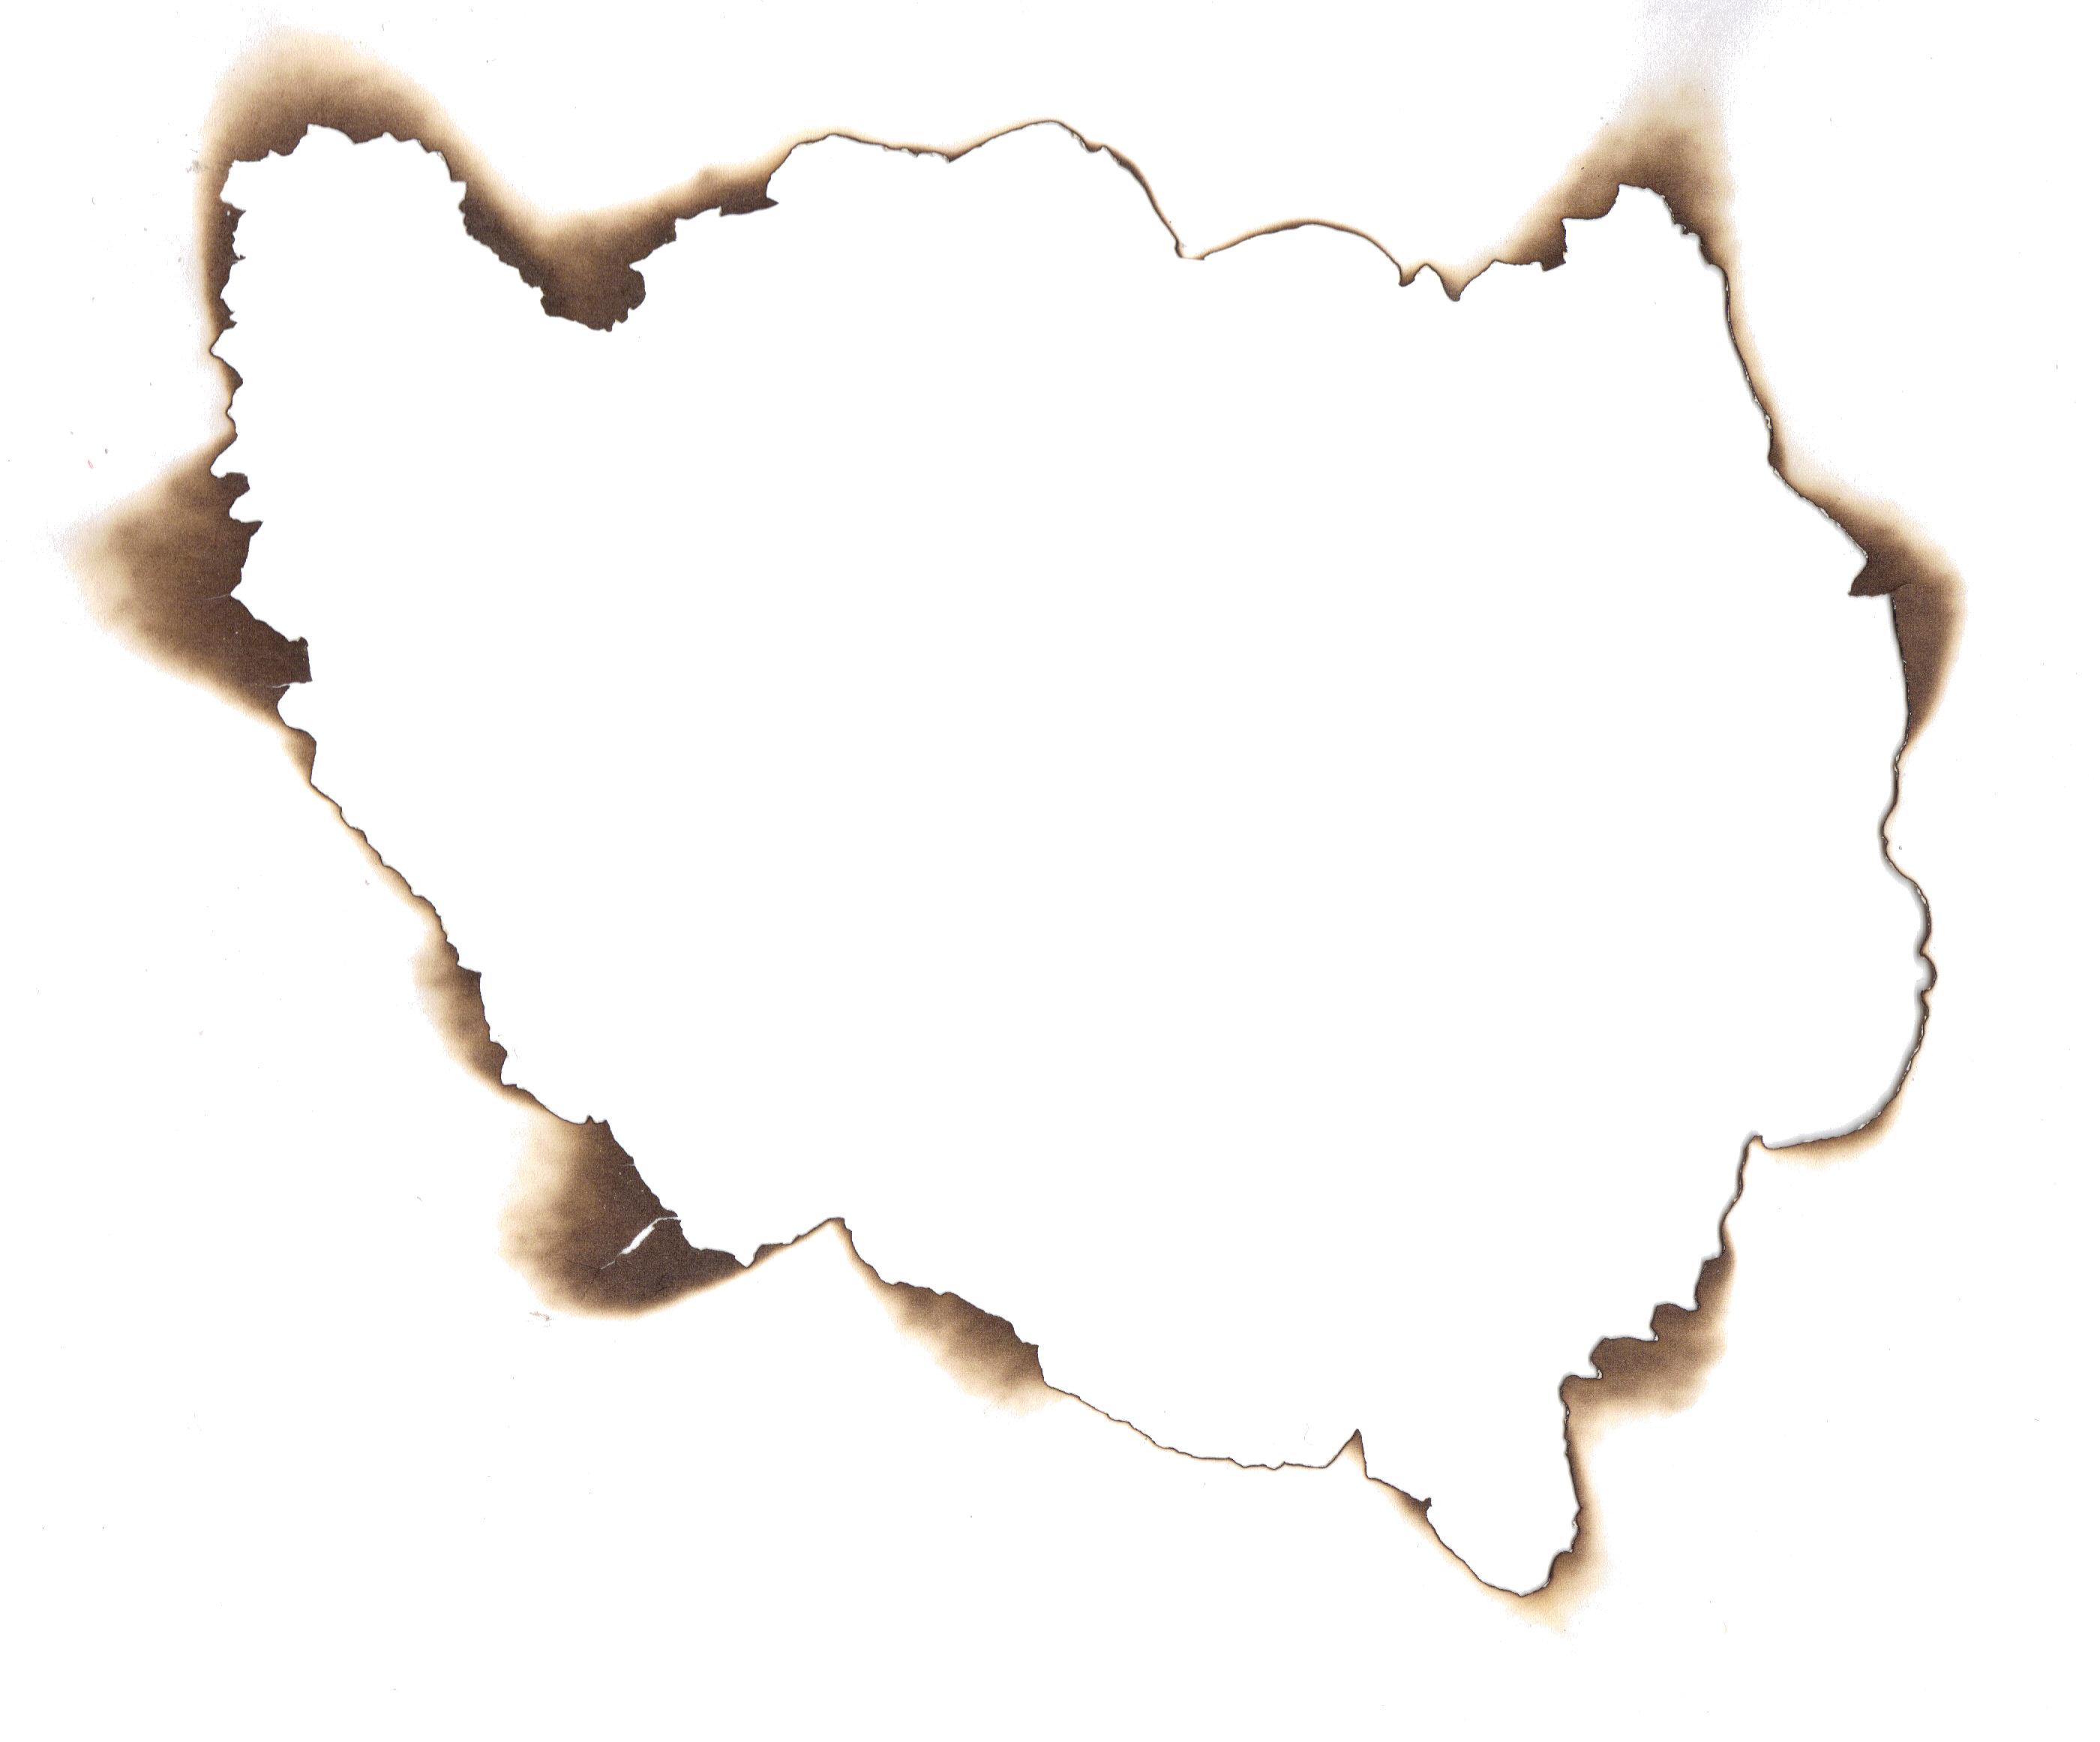 burnt paper Design your own burnt paper logo for free.